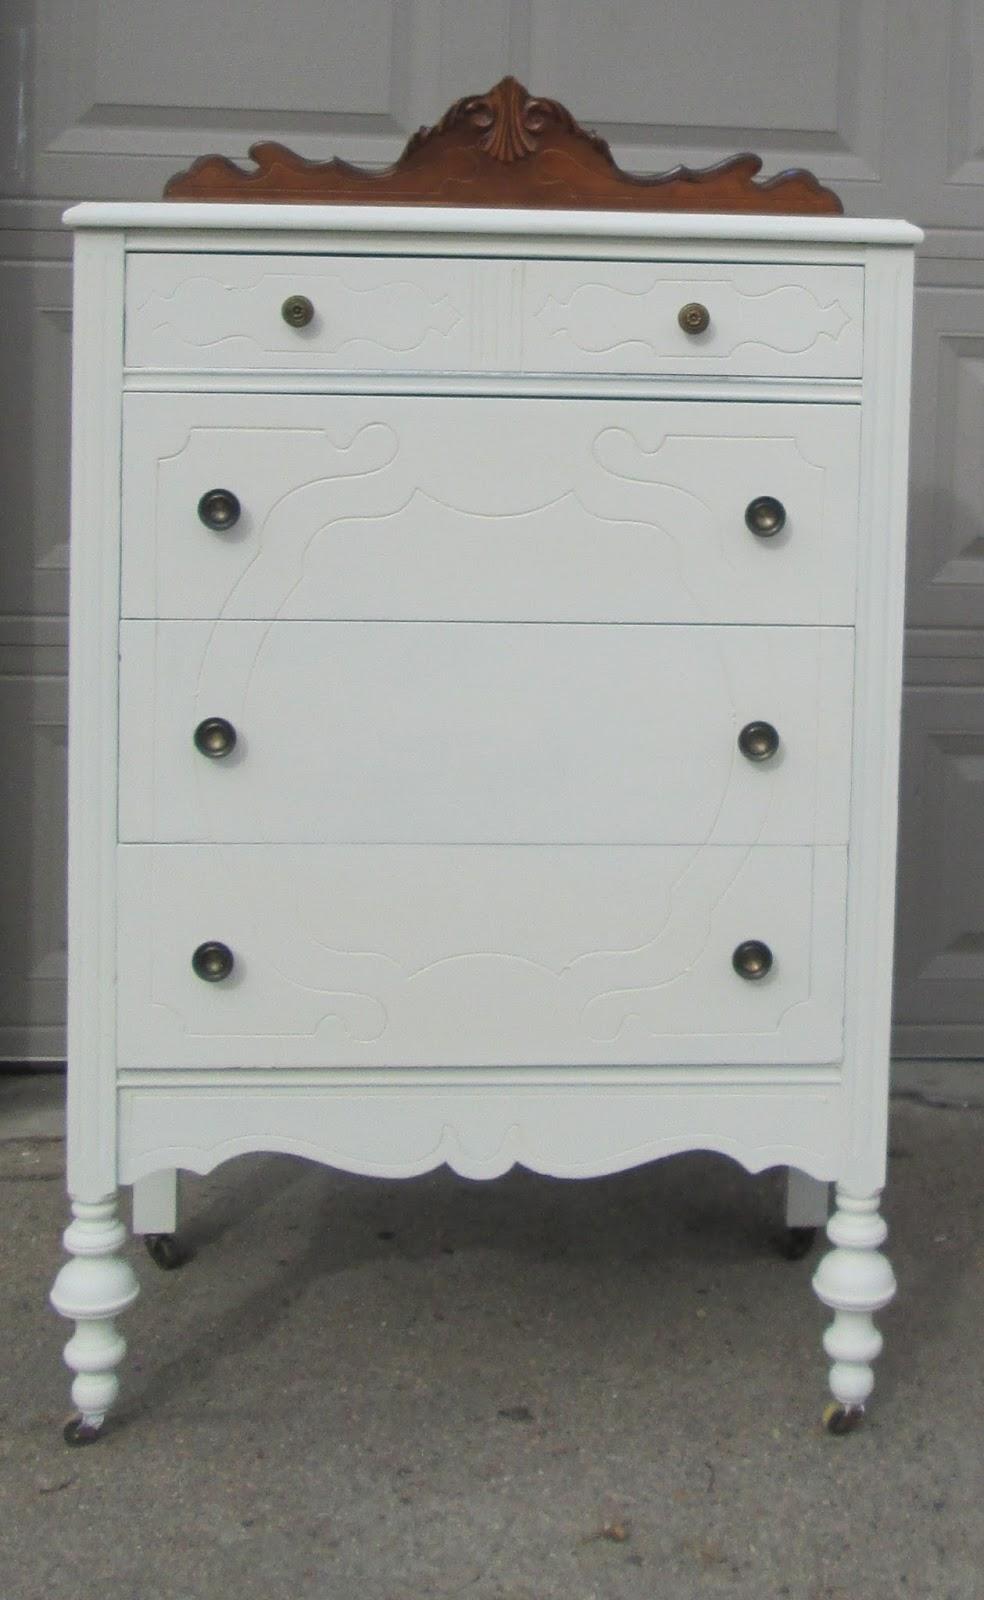 Mid Century Furniture : IMG1407 from pixelrz.com size 984 x 1600 jpeg 153kB